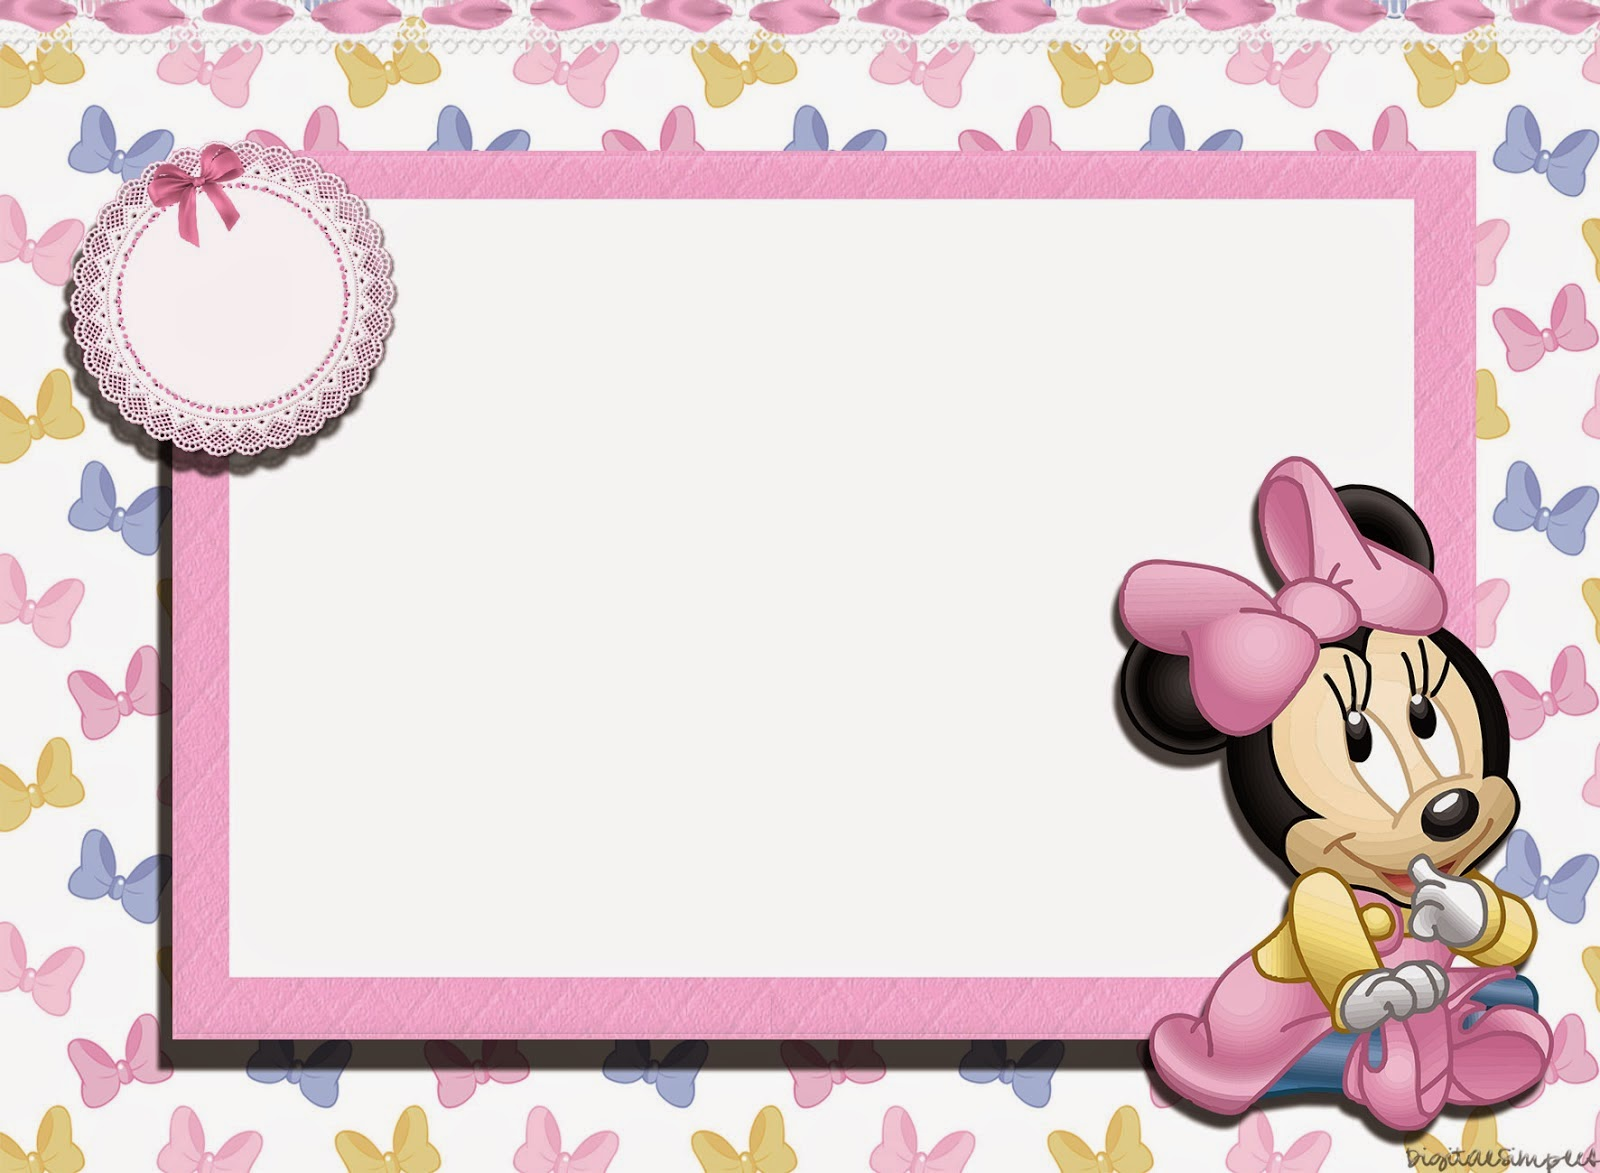 Minnie beb invitaci n y cajas para imprimir gratis oh my beb - Image minnie bebe ...